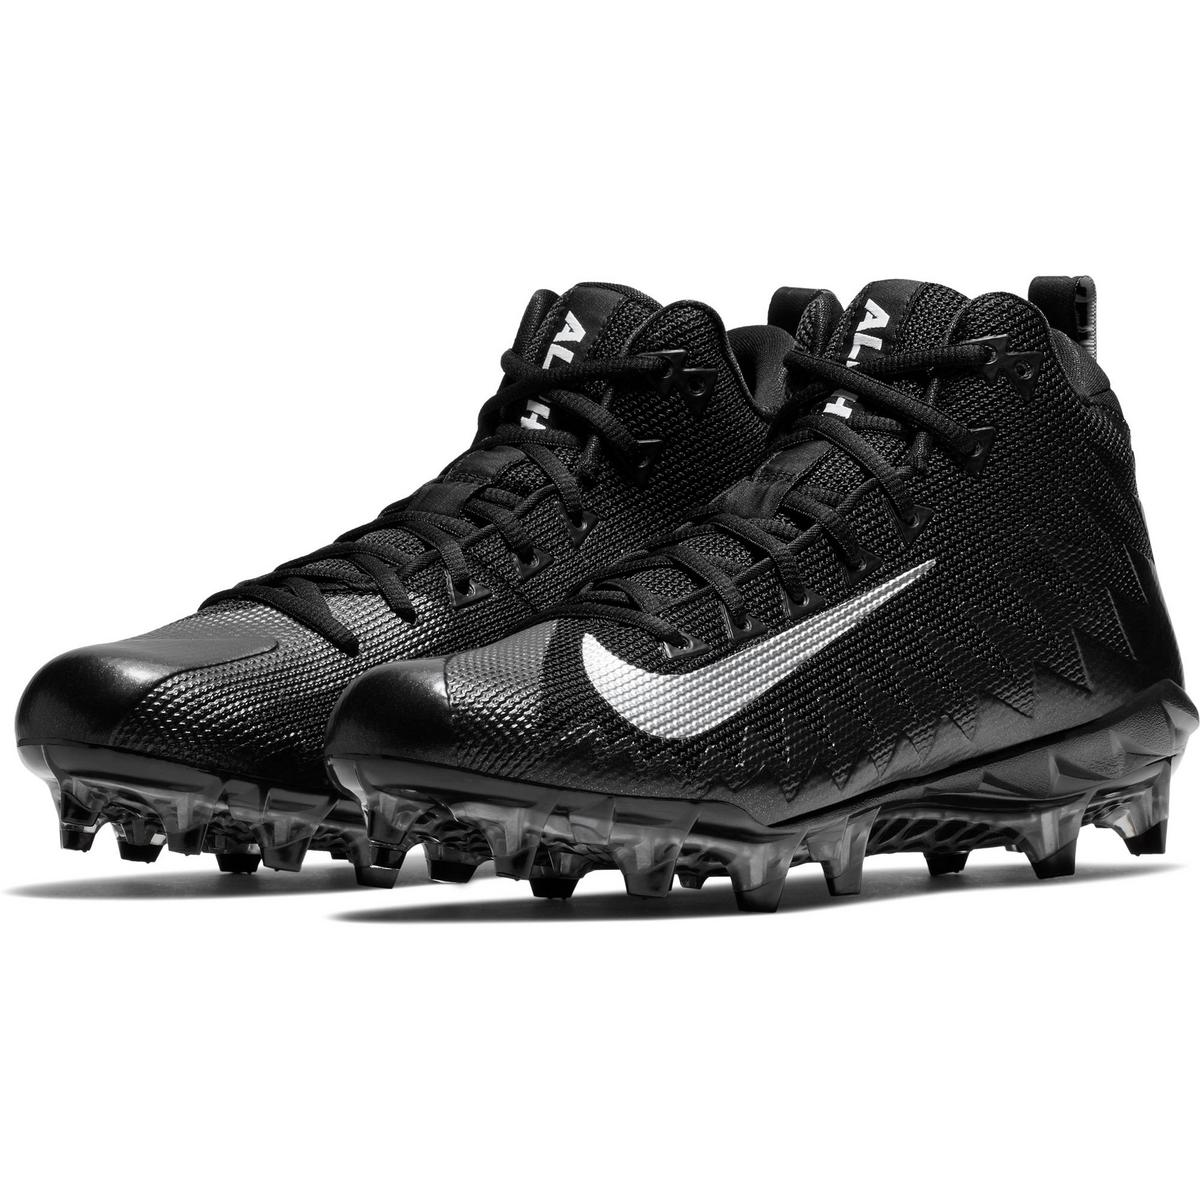 Nike Alpha Menace Pro Mid Wide PF Football Cleats